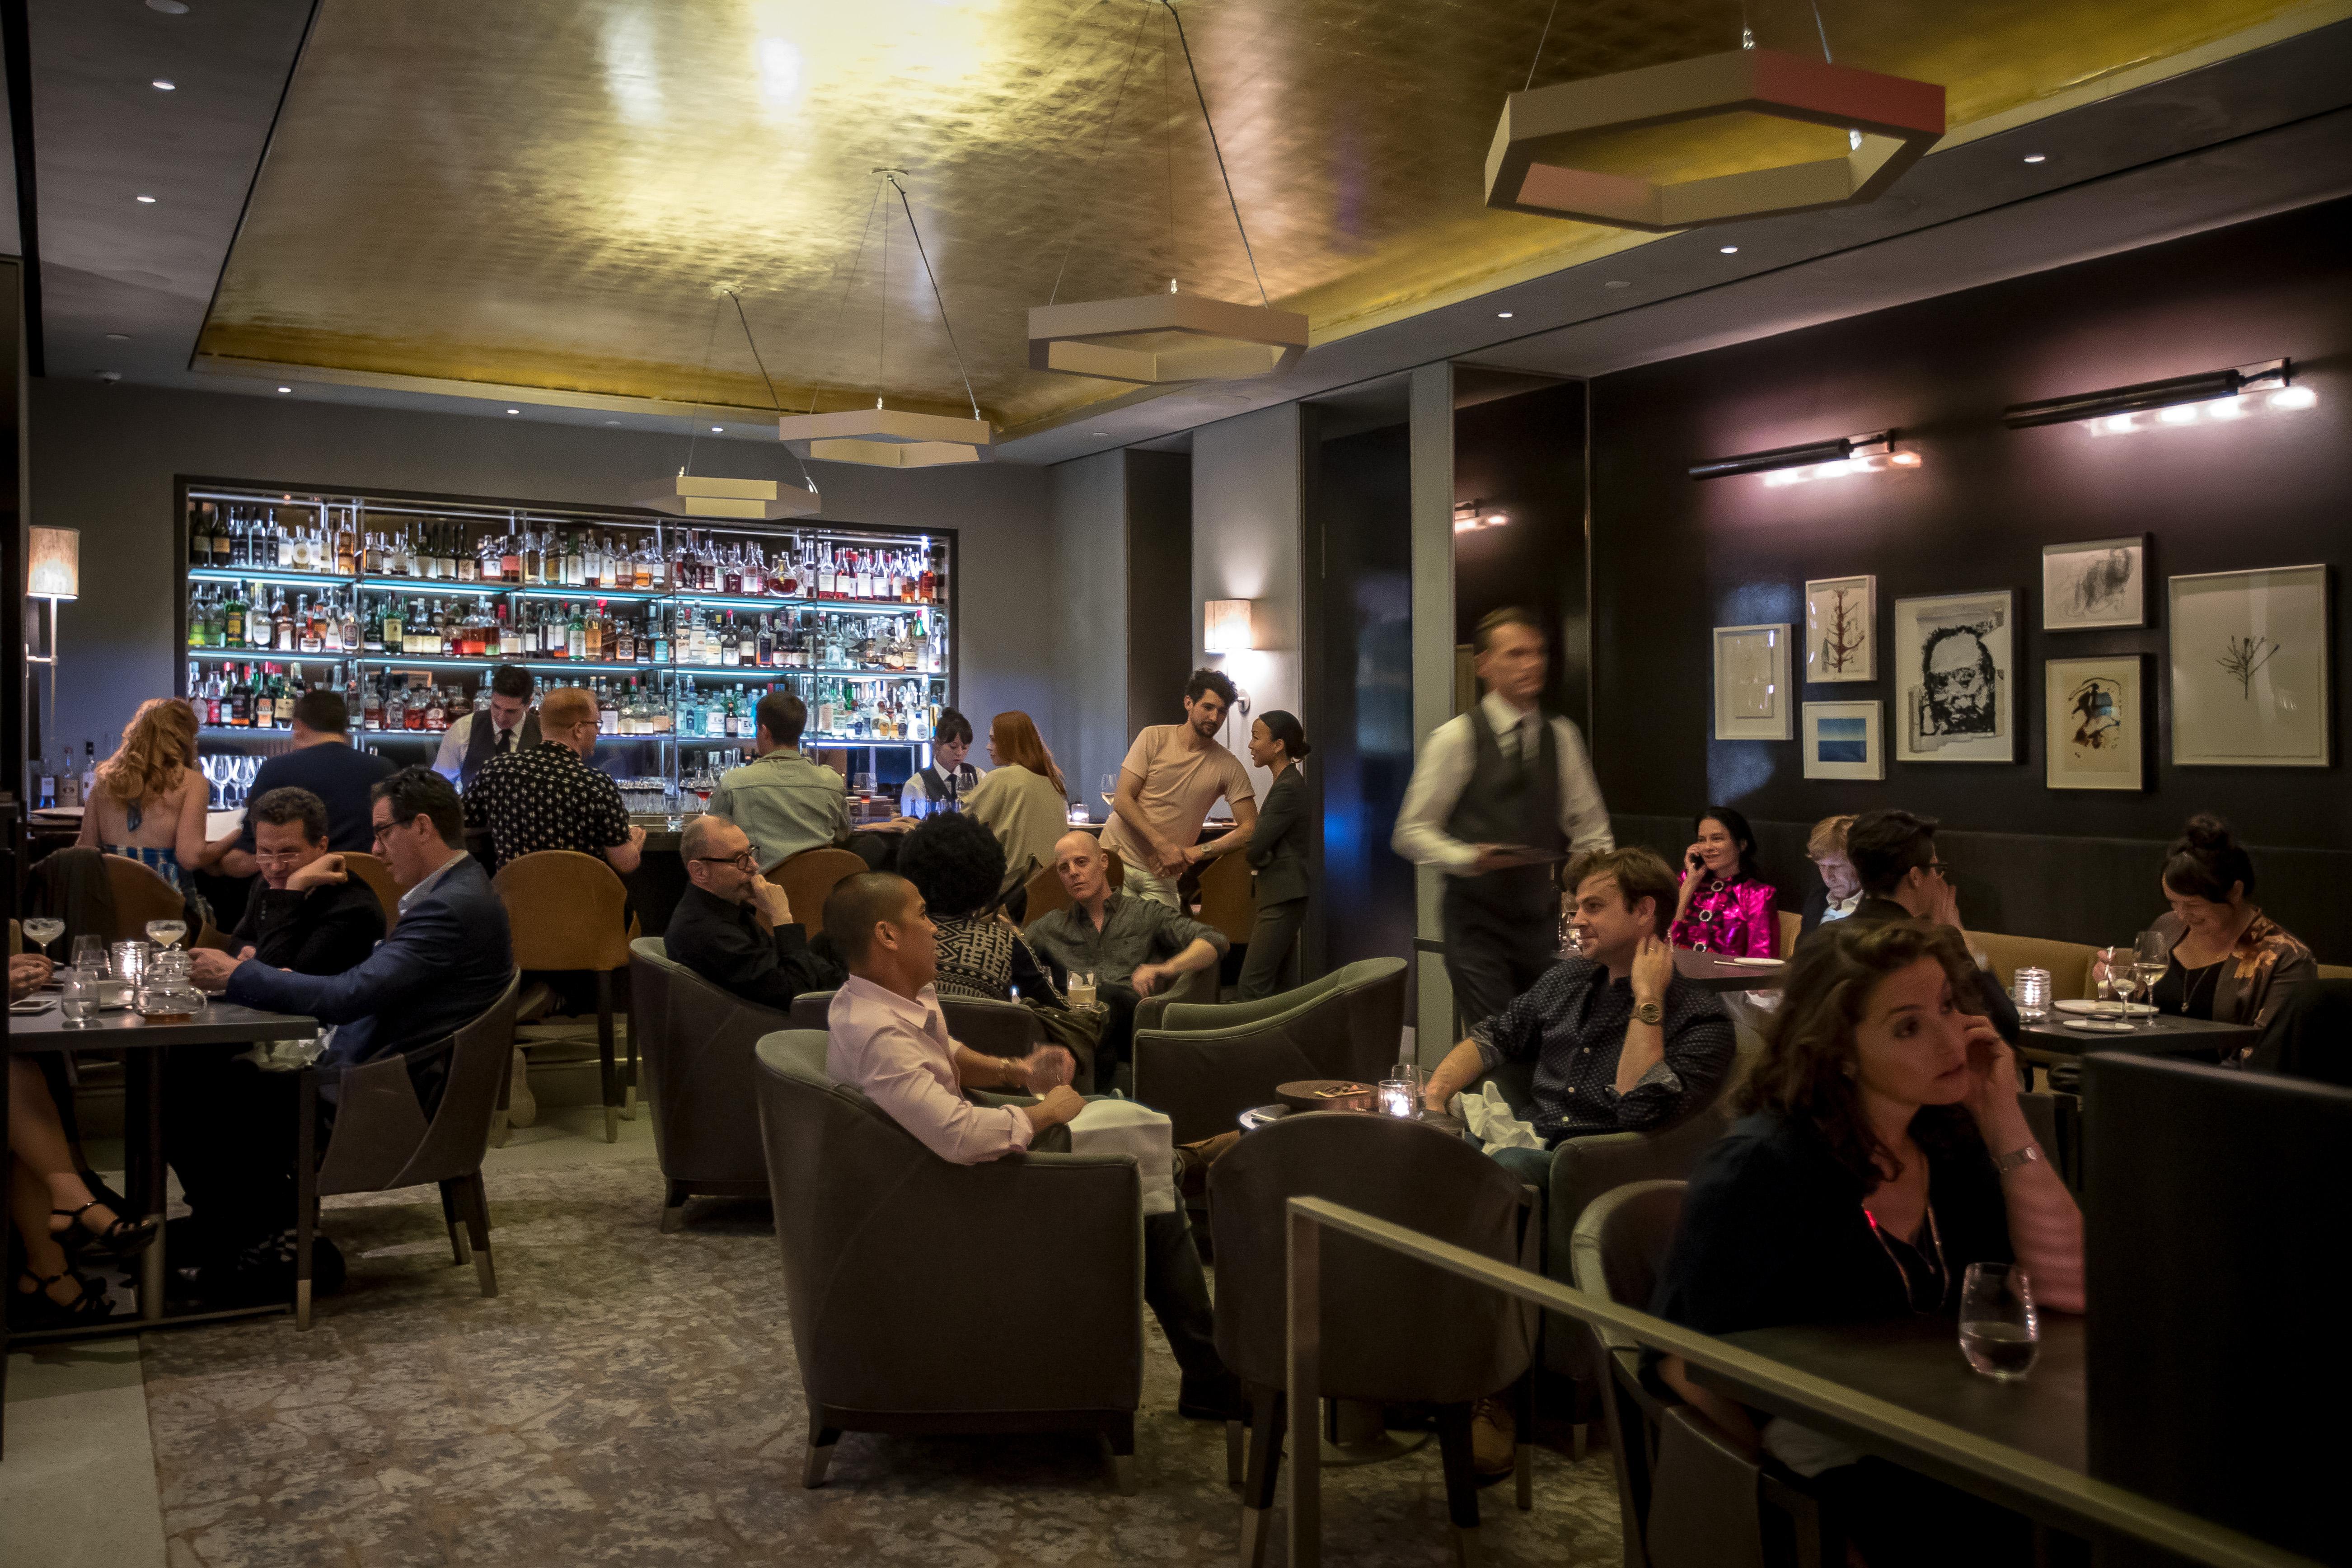 Eleven Madison Park's bar area